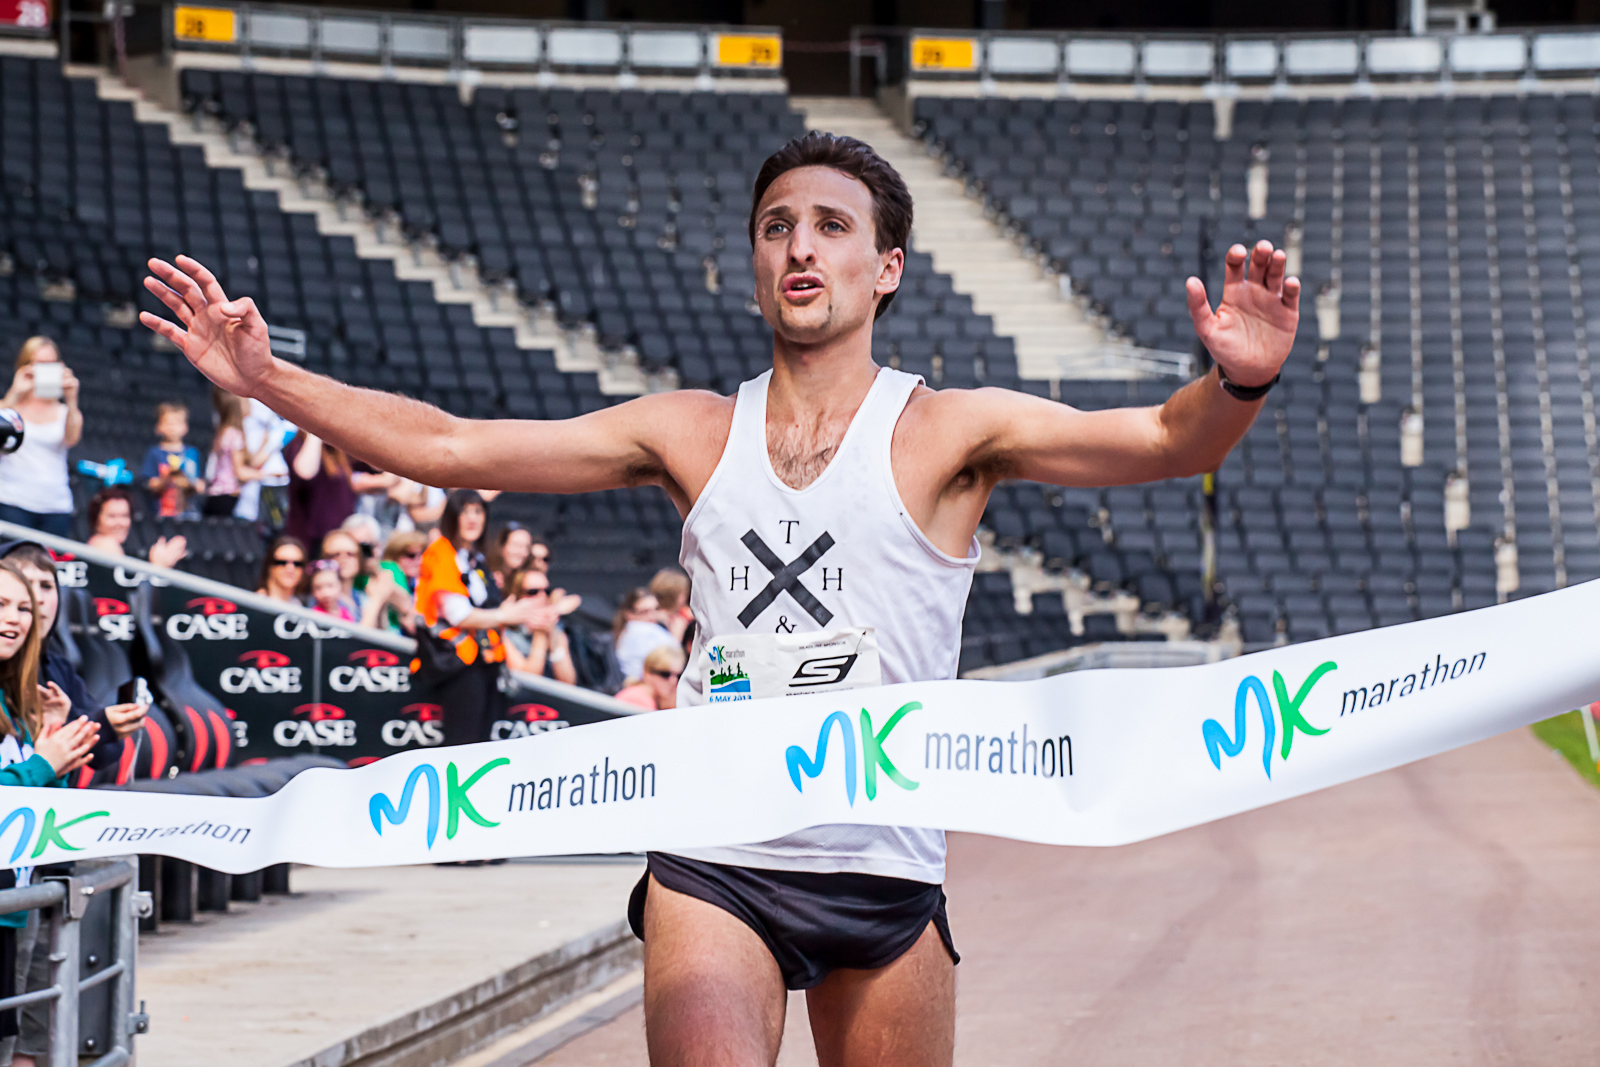 milton keynes marathon finish